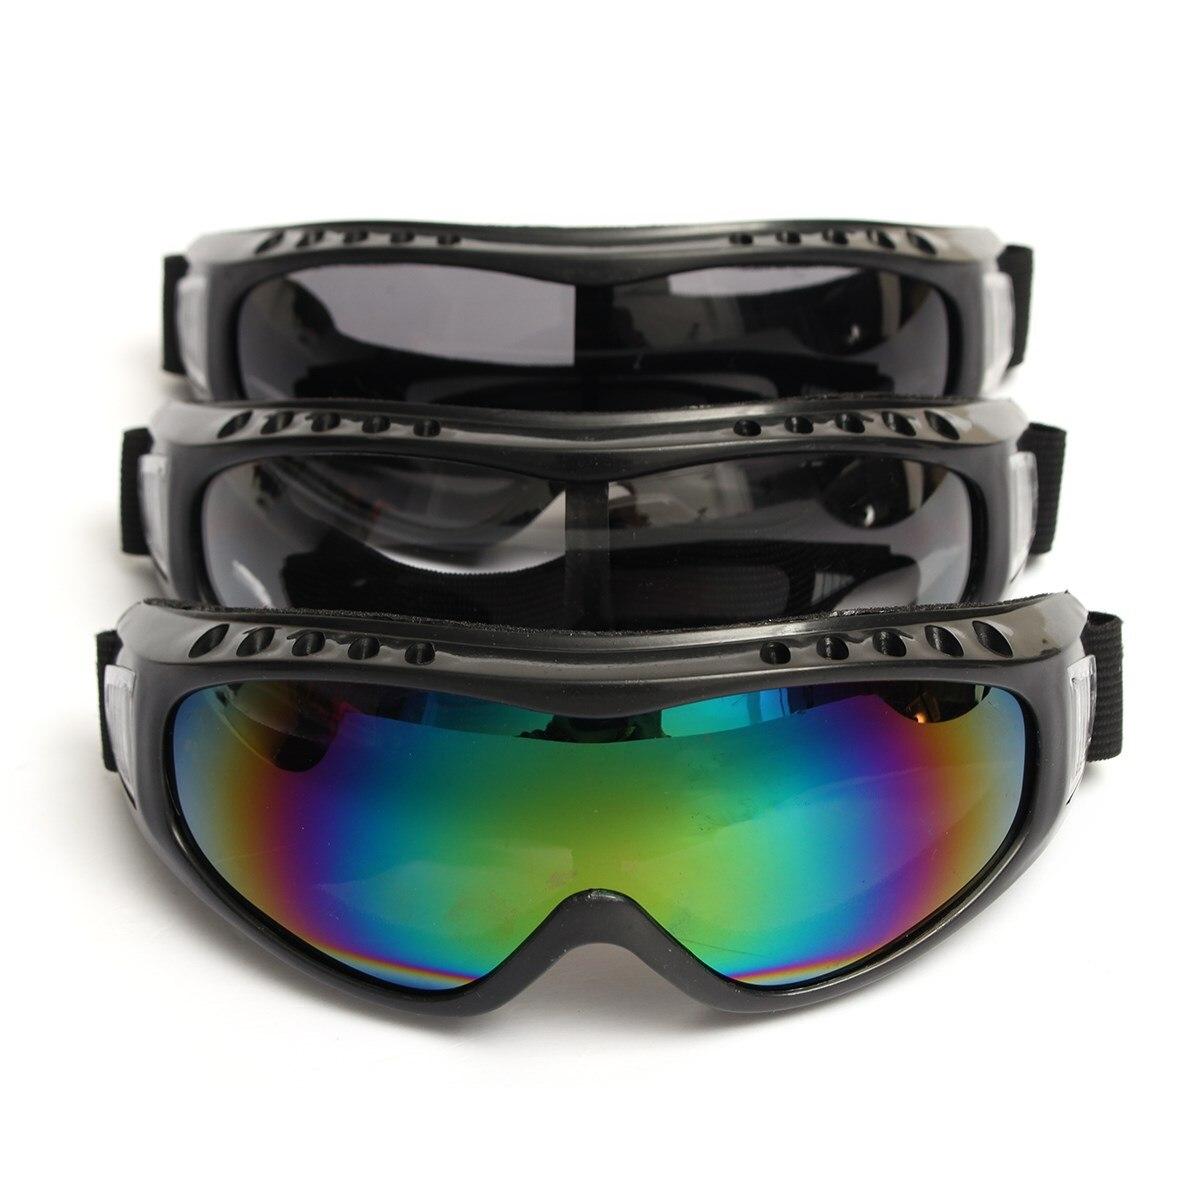 Outdoor Sport Motocross ATV Dirt Bike Off Road Racing Goggles Motorcycle Glasses Surfing Dustproof